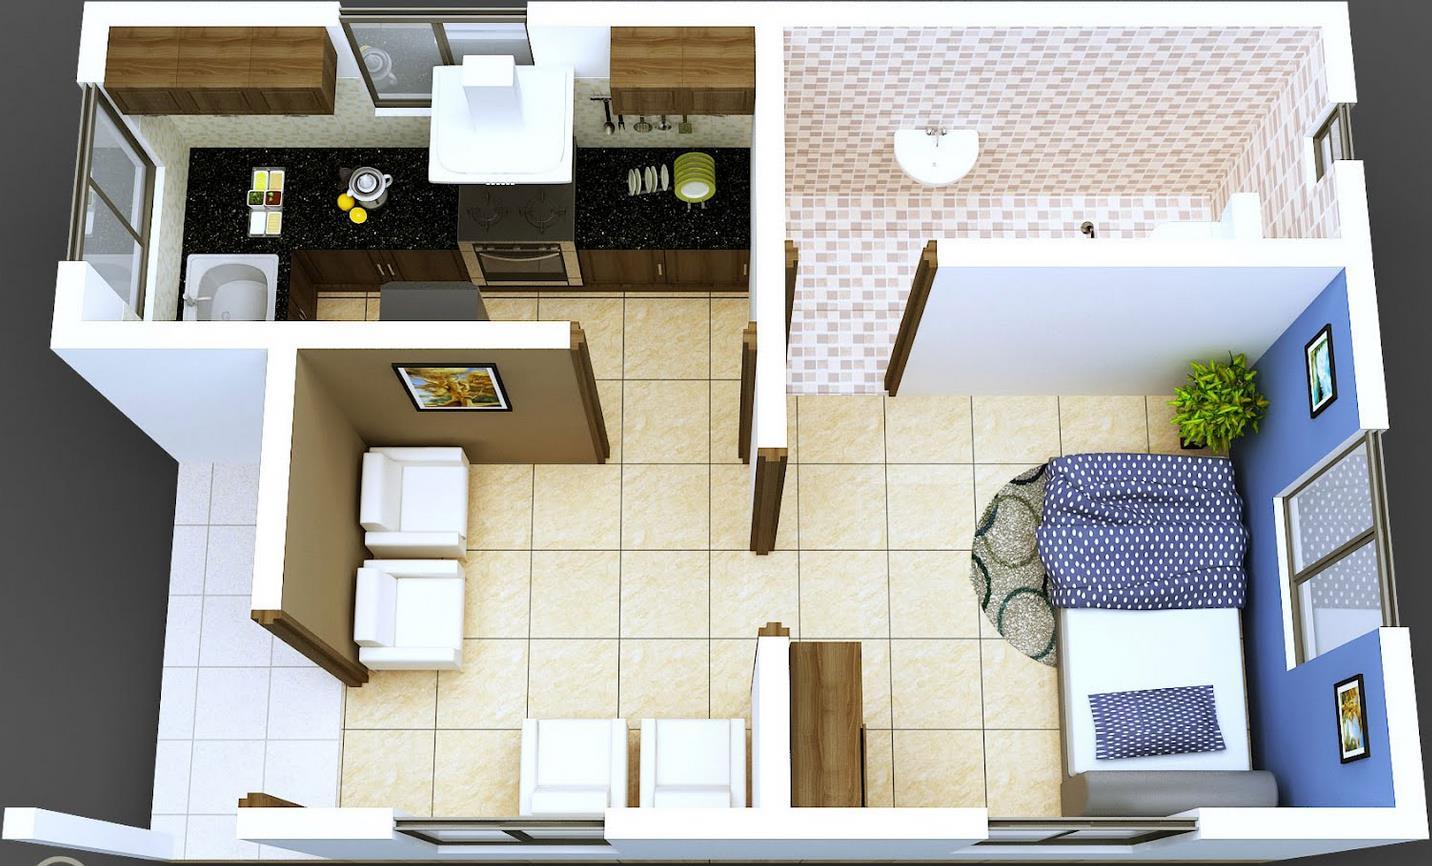 Plano moderno de departamento en 50 metros cuadrados for Maquetas de apartamentos modernos